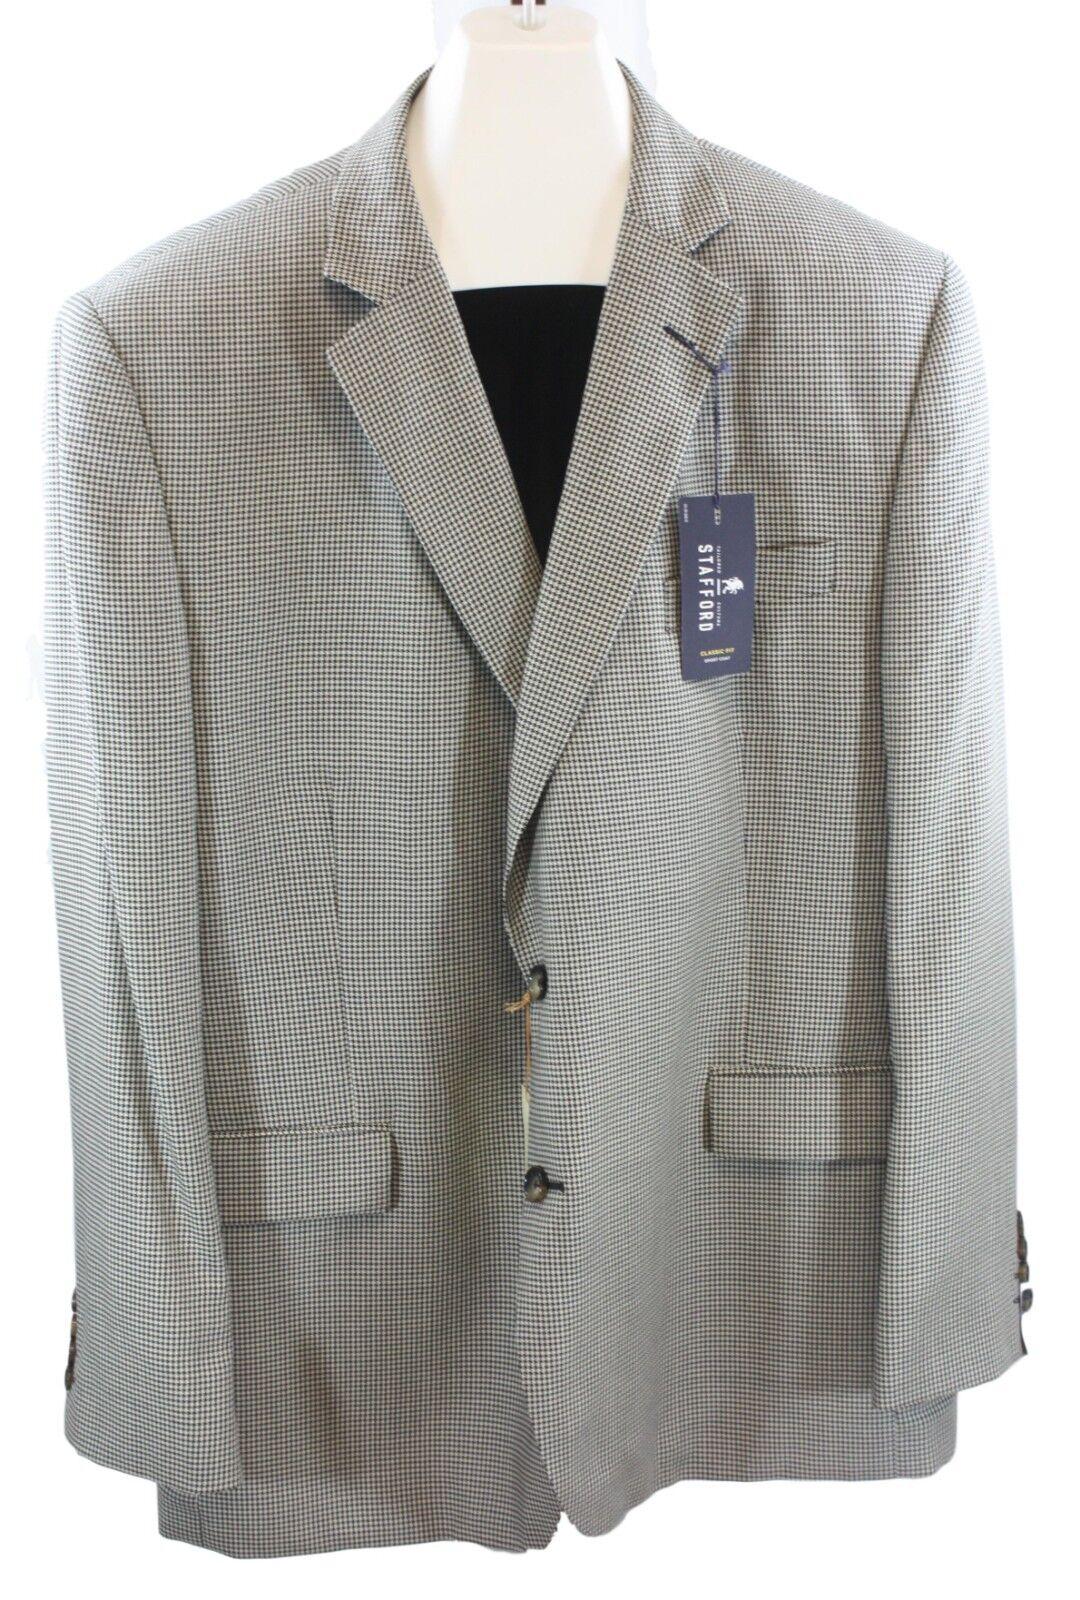 Mens Stafford Navy White Herringbone Silk Wool  Sport Coat Size 48R NWT